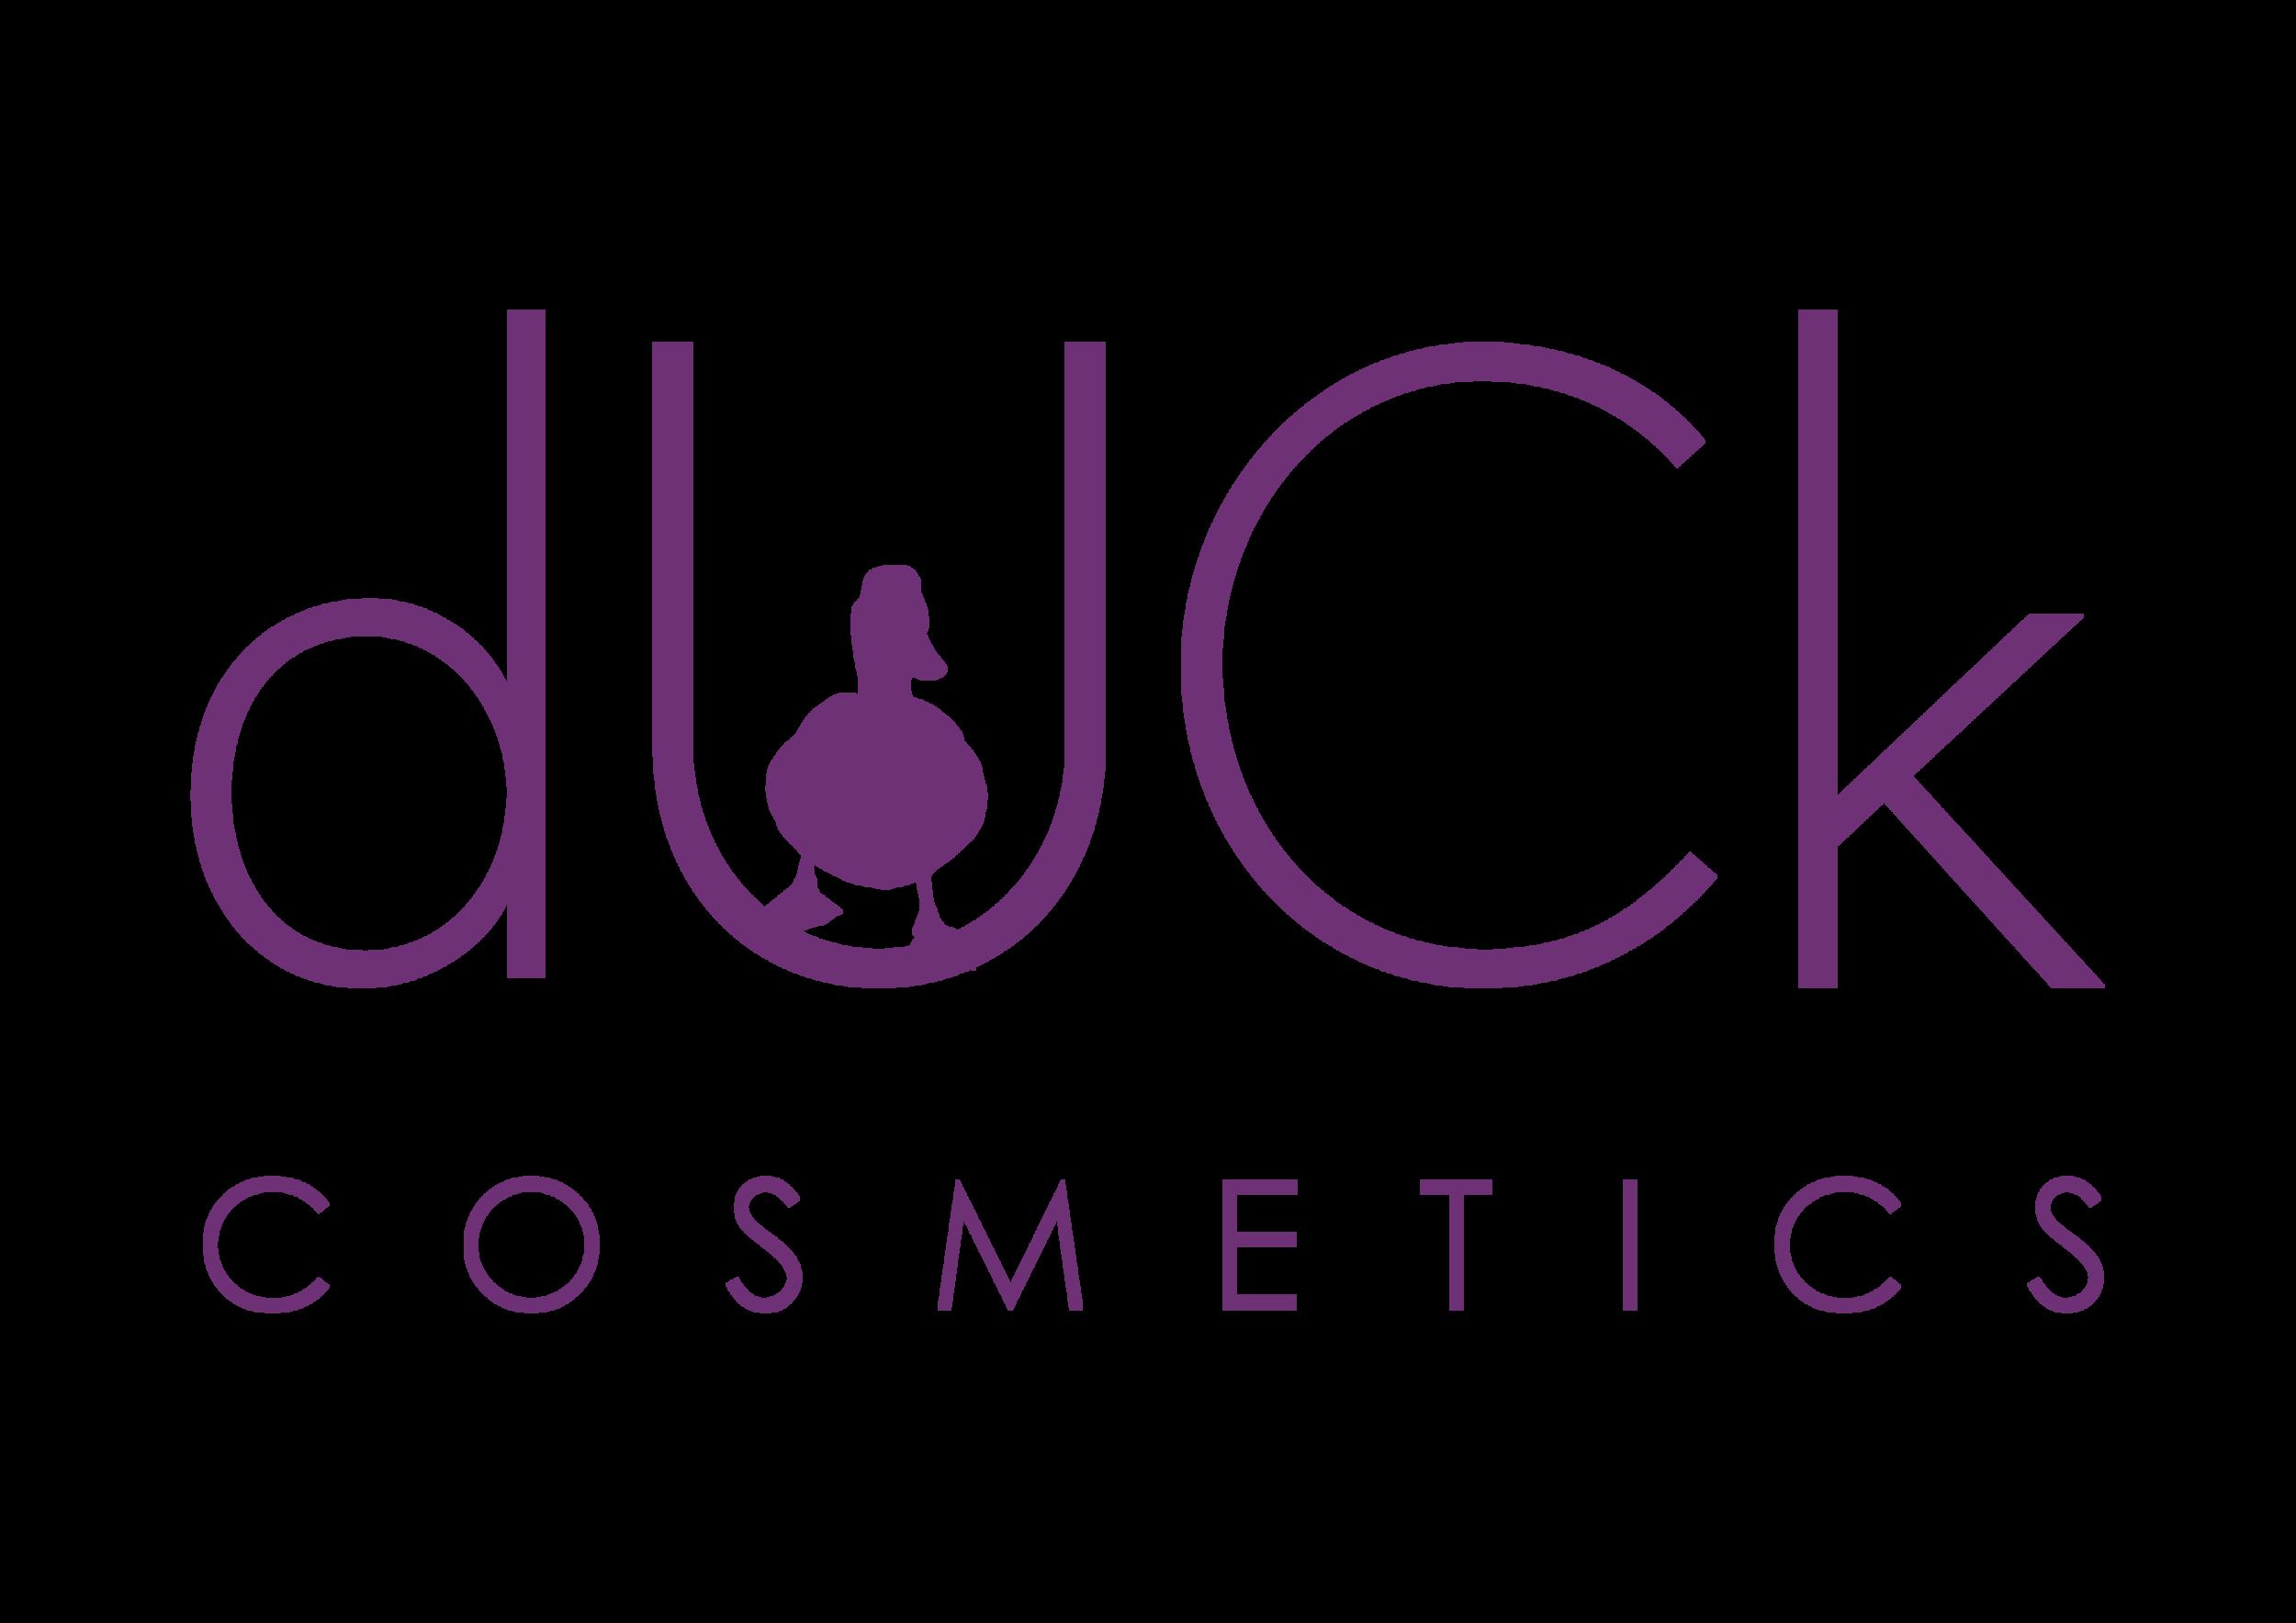 duck cosmetics logo-01.png